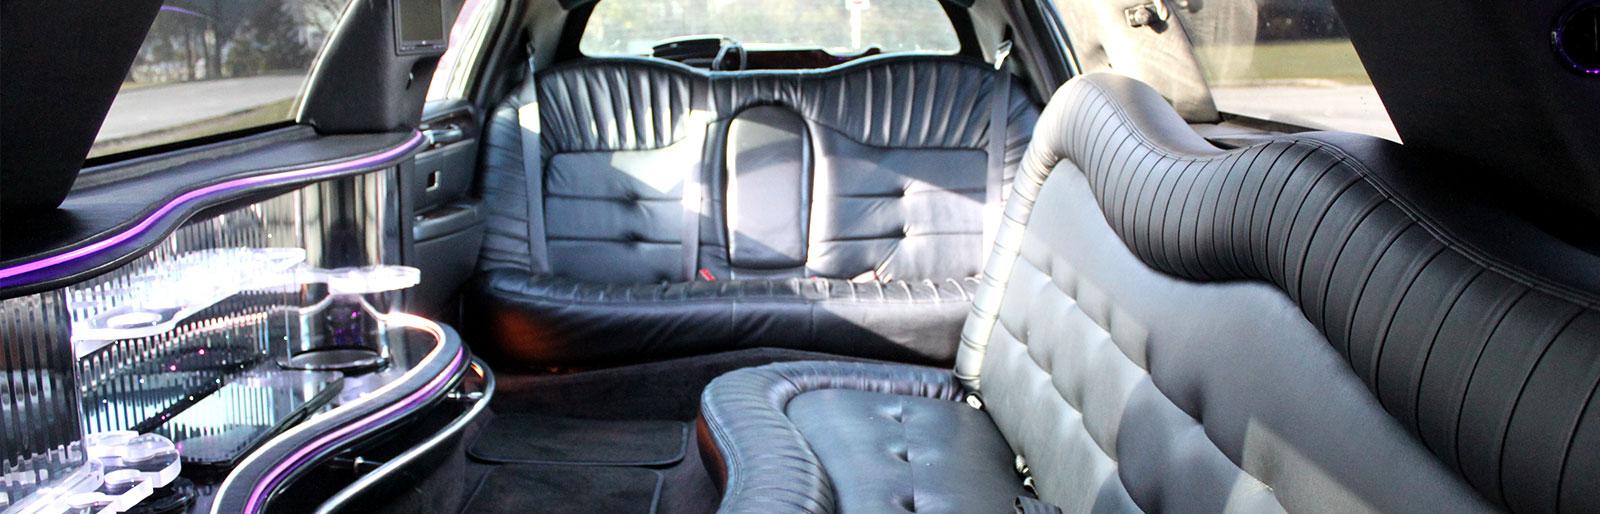 eternity-limo-slide05